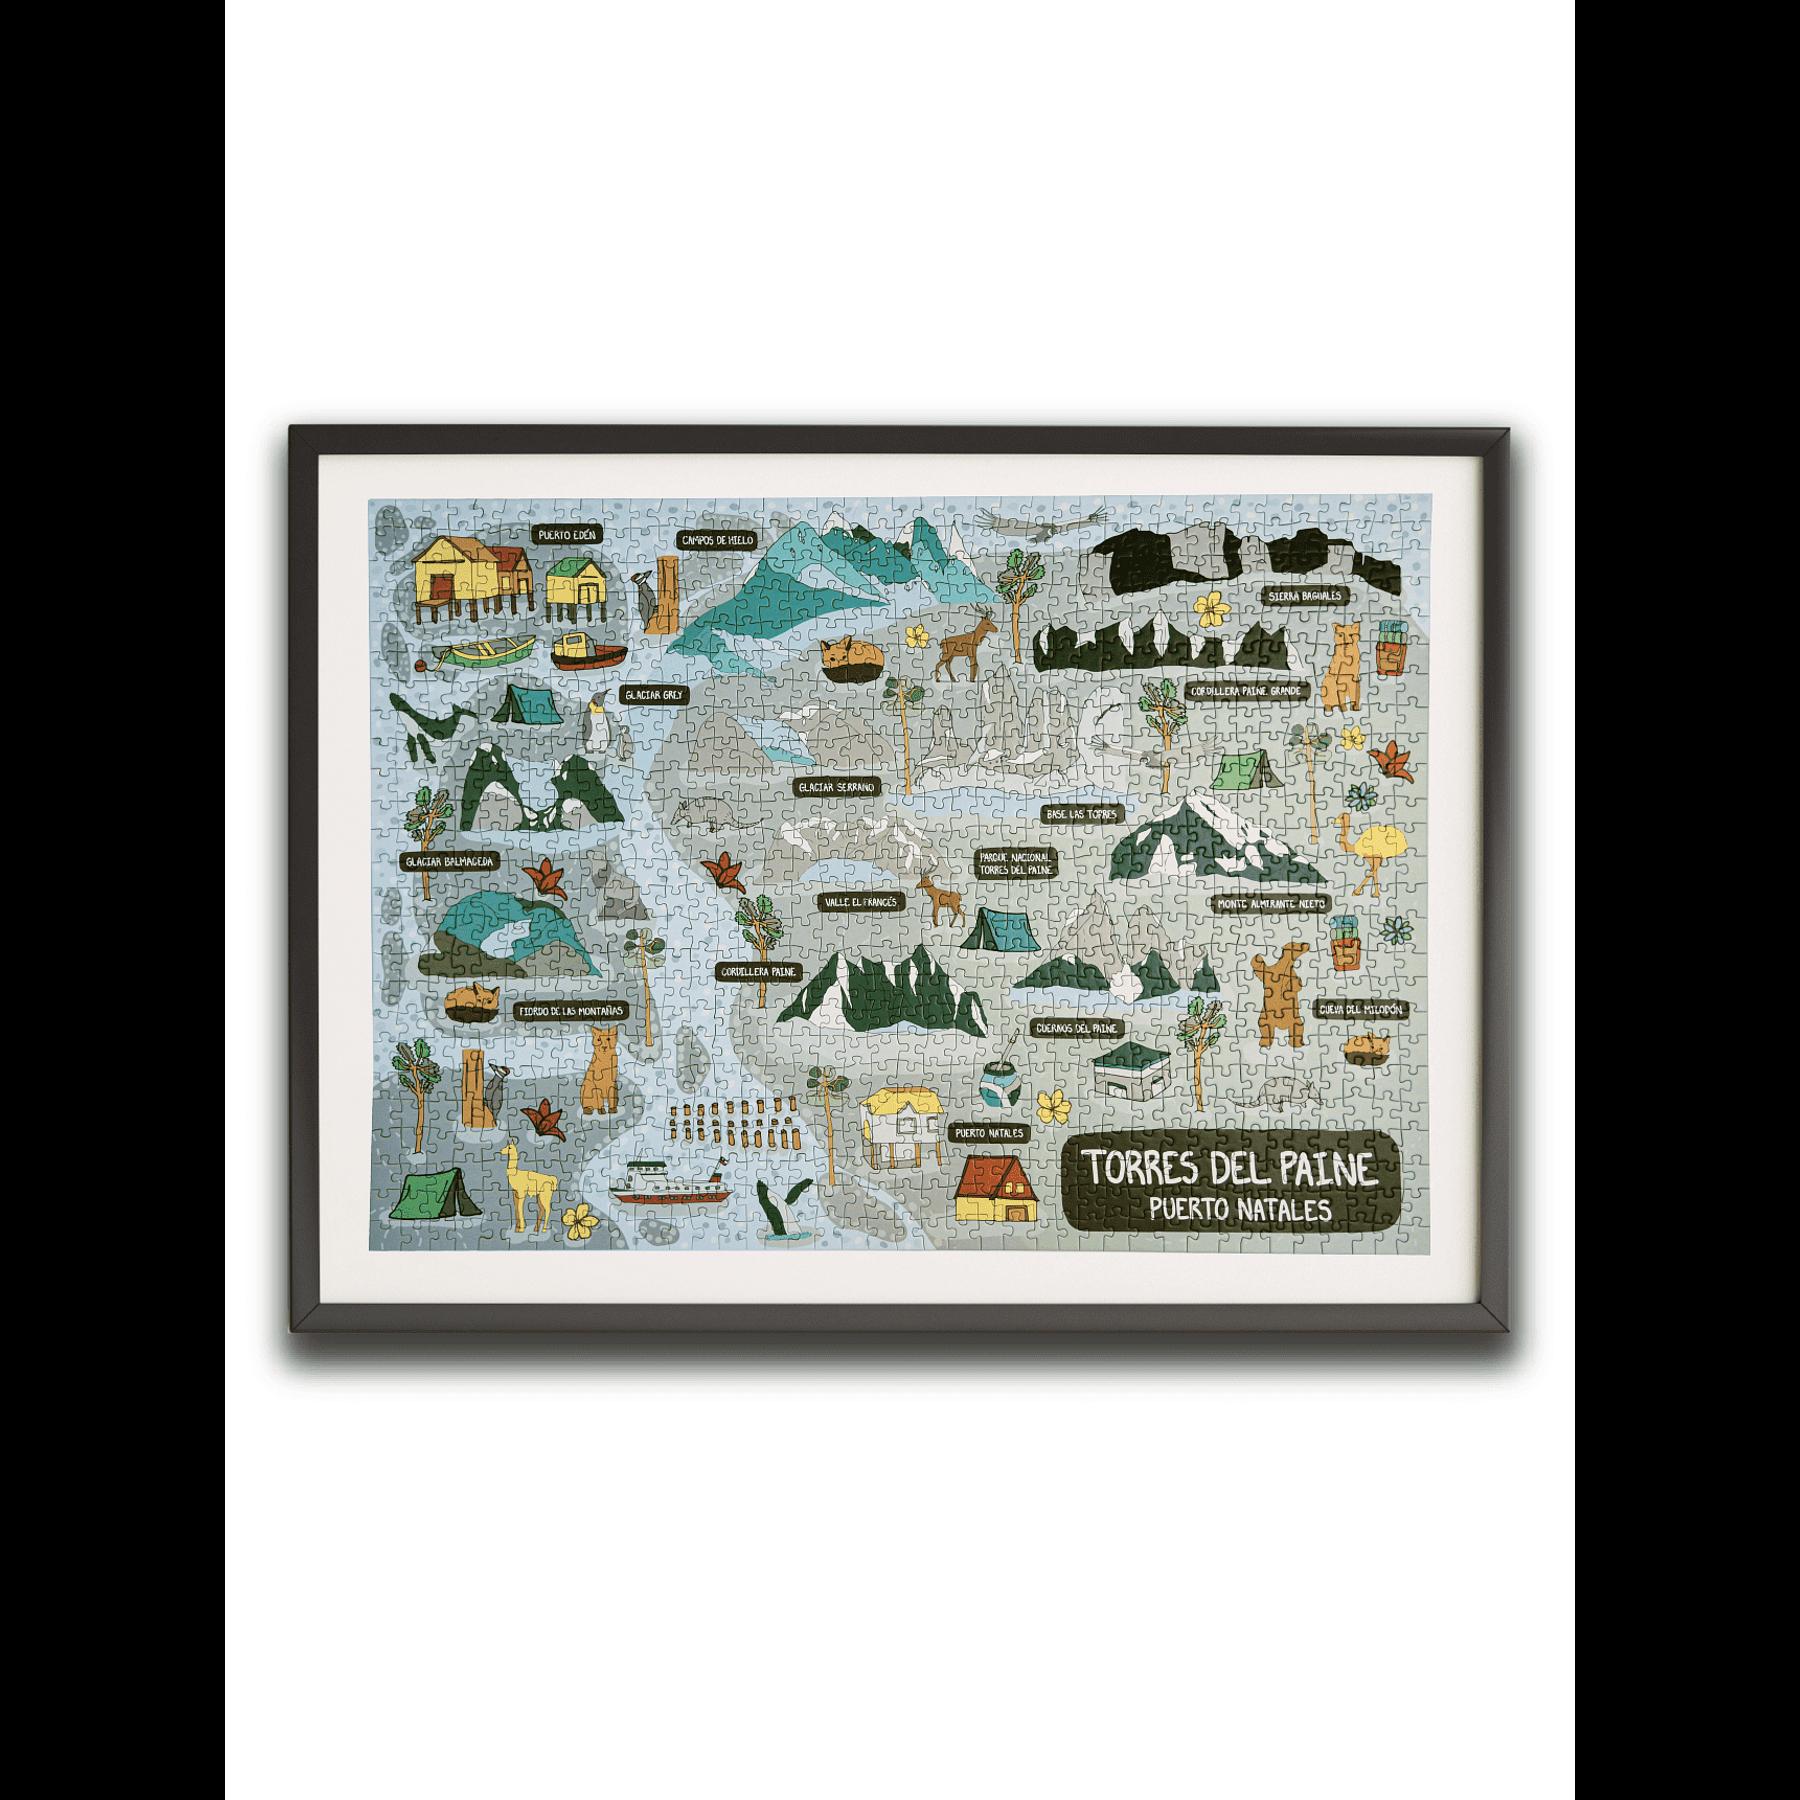 Puzzle Puerto Natales /Torres del Paine 1000 Piezas